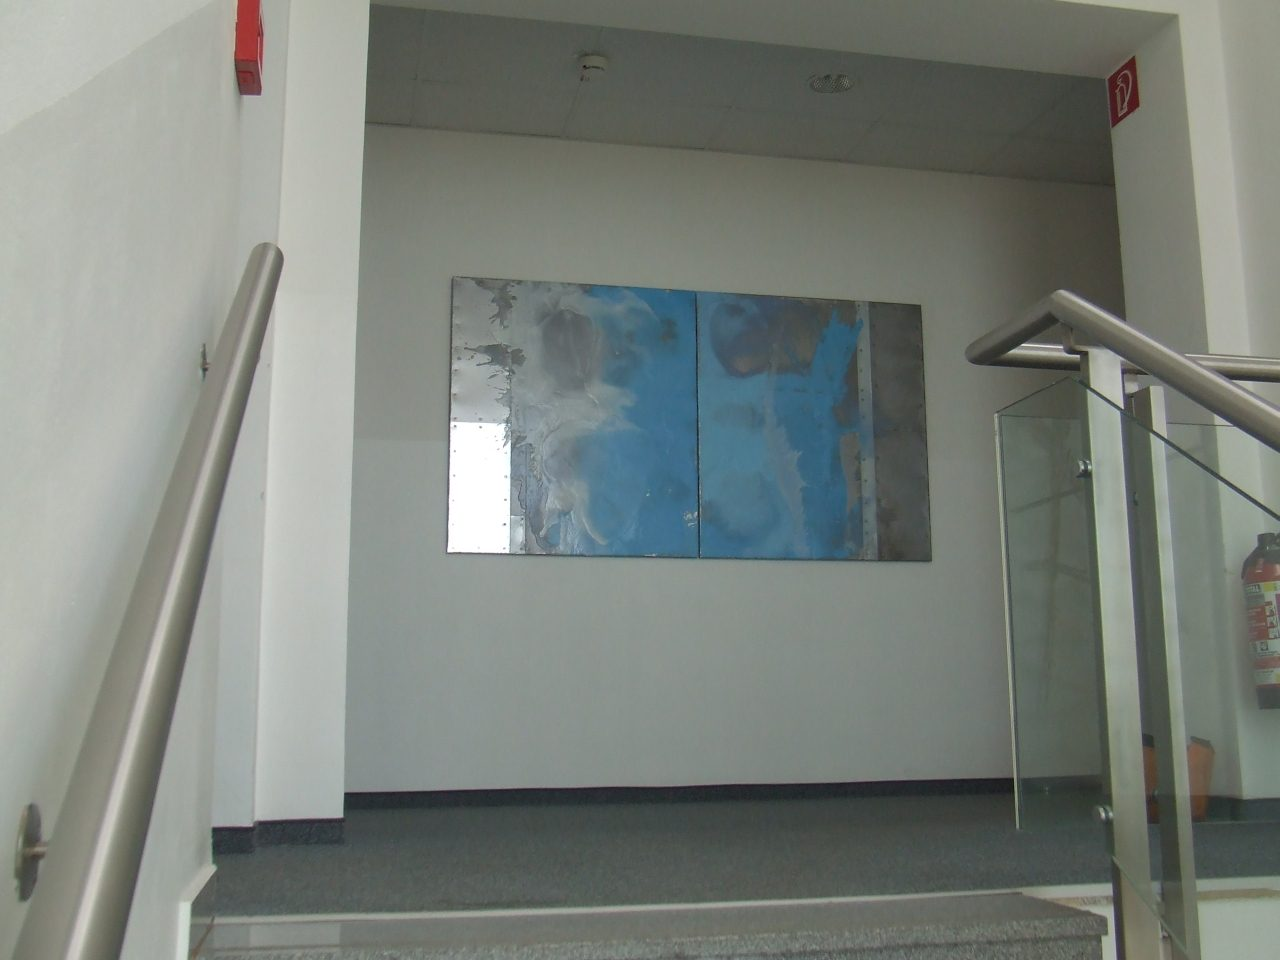 projekt stiegenhaus chefetage, oil on metal, 111x202cm